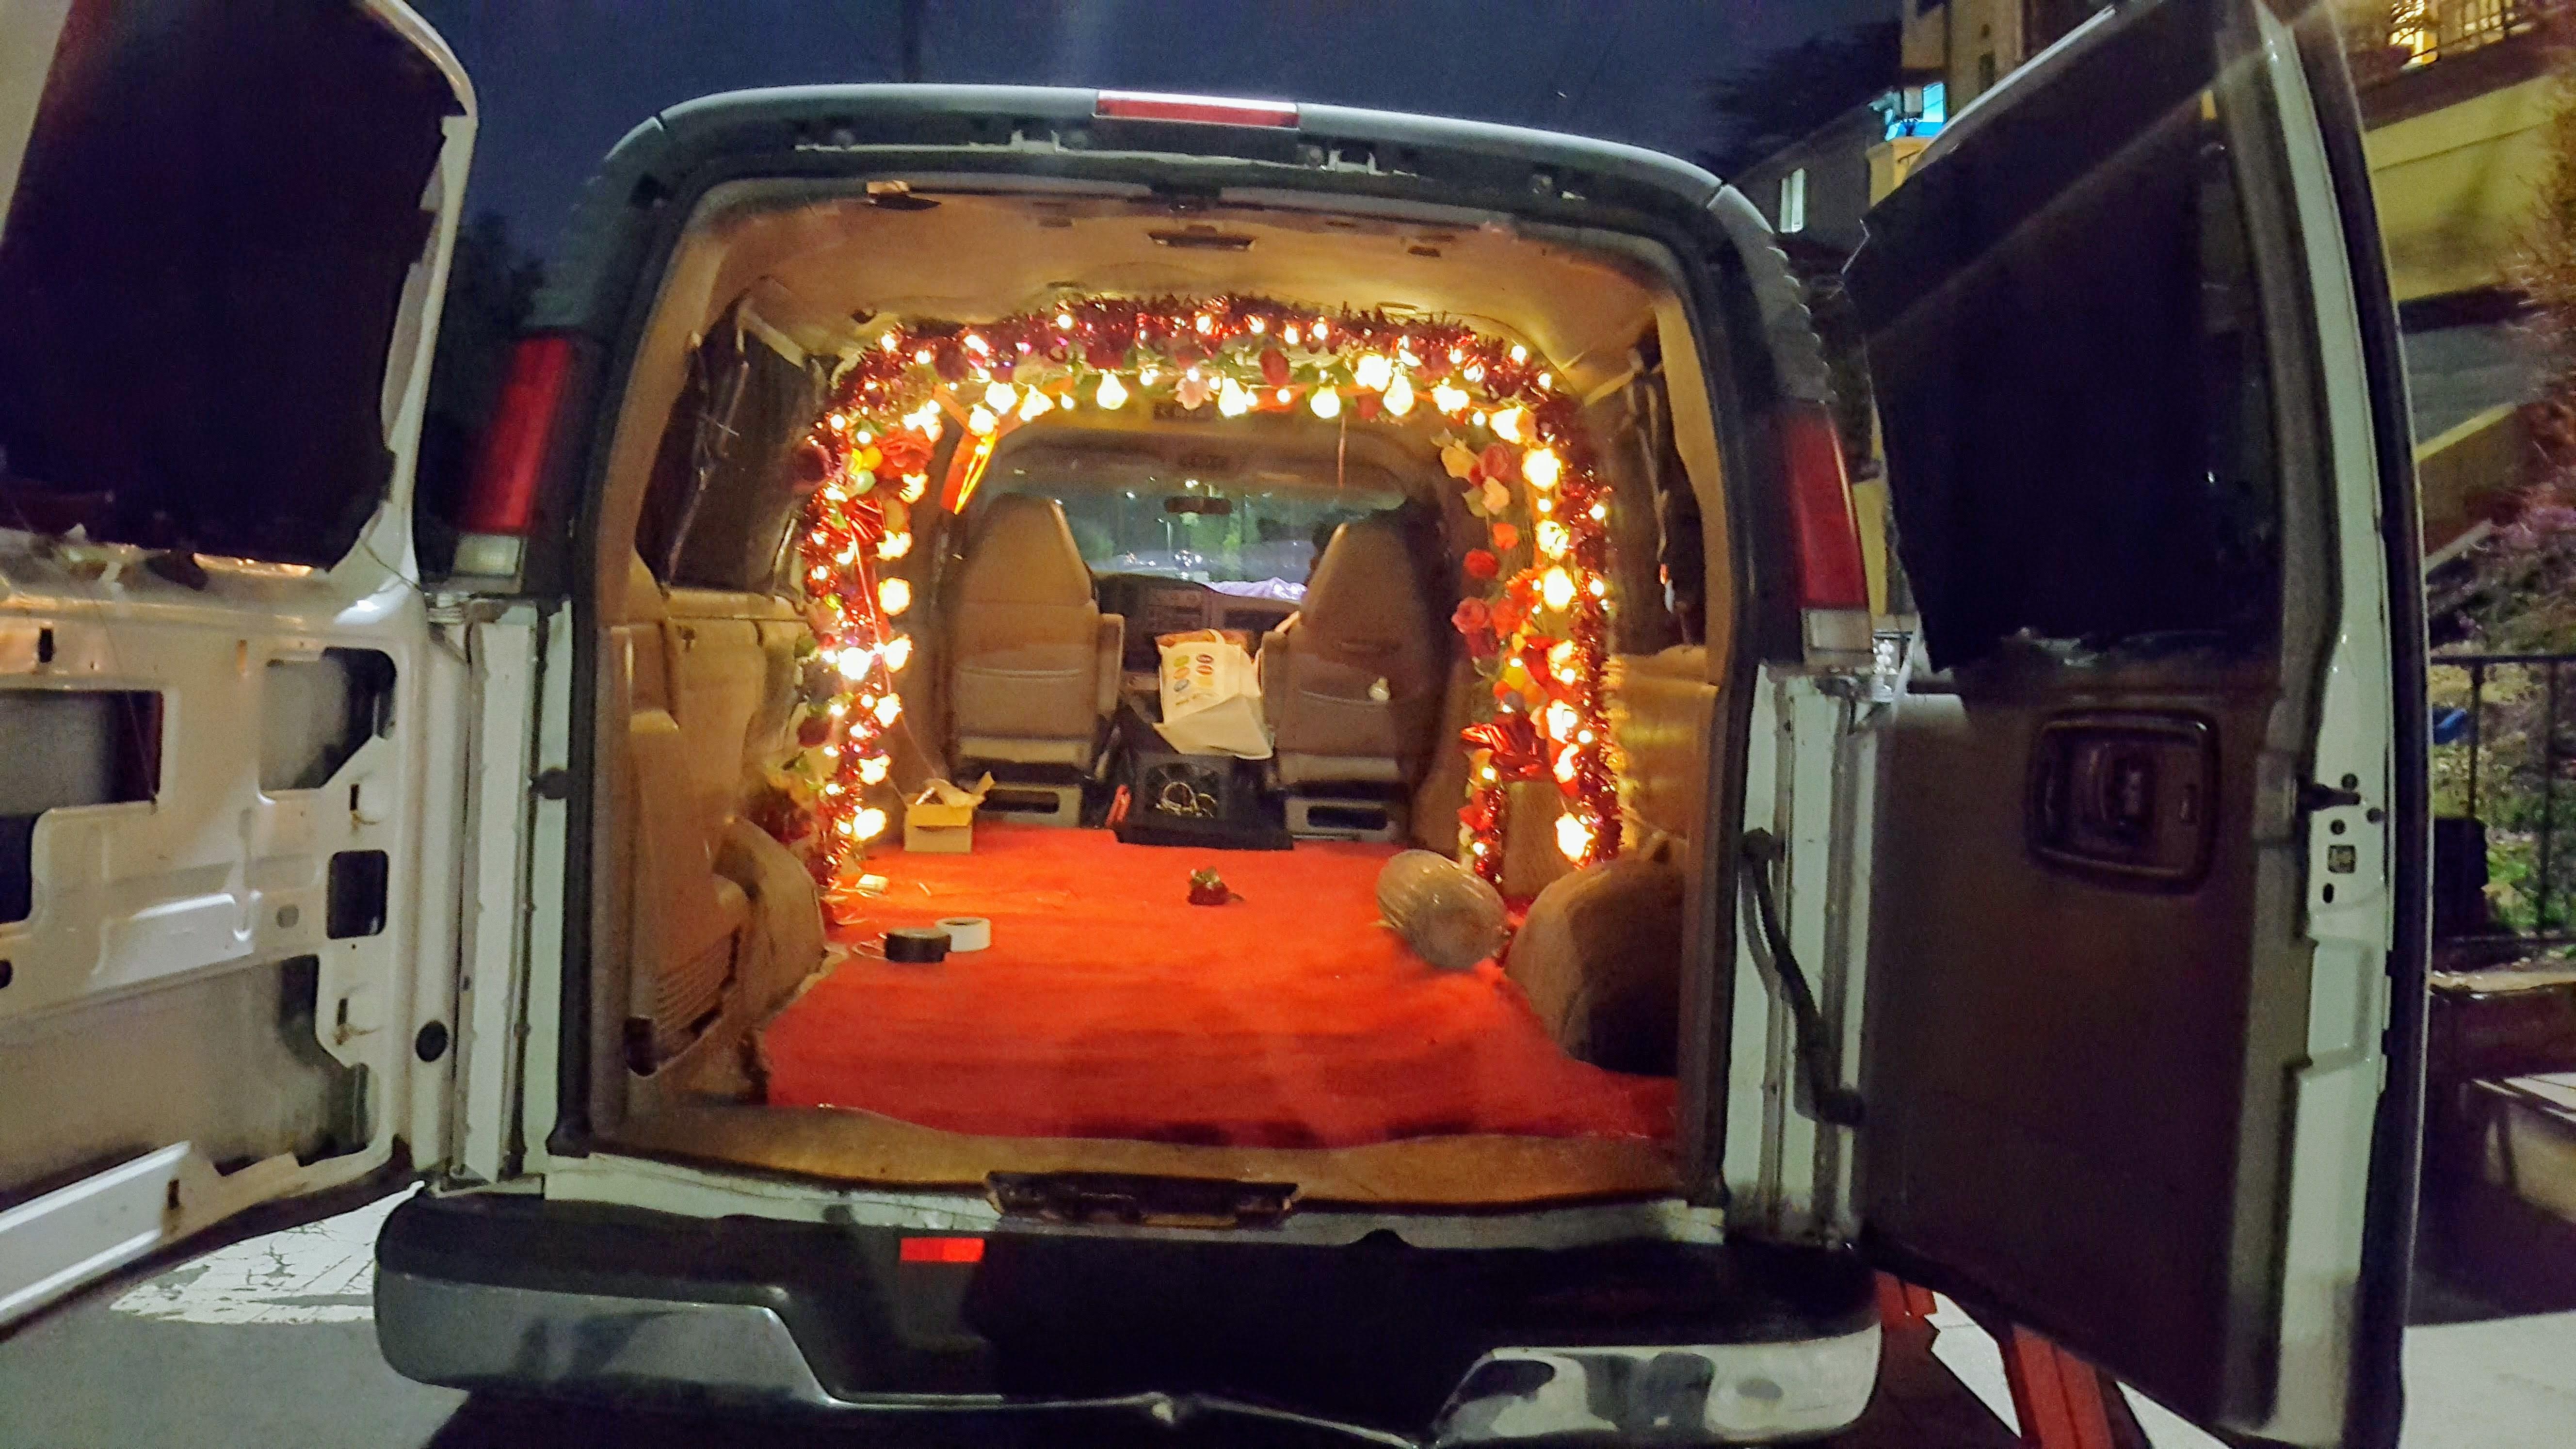 The Valentine Van